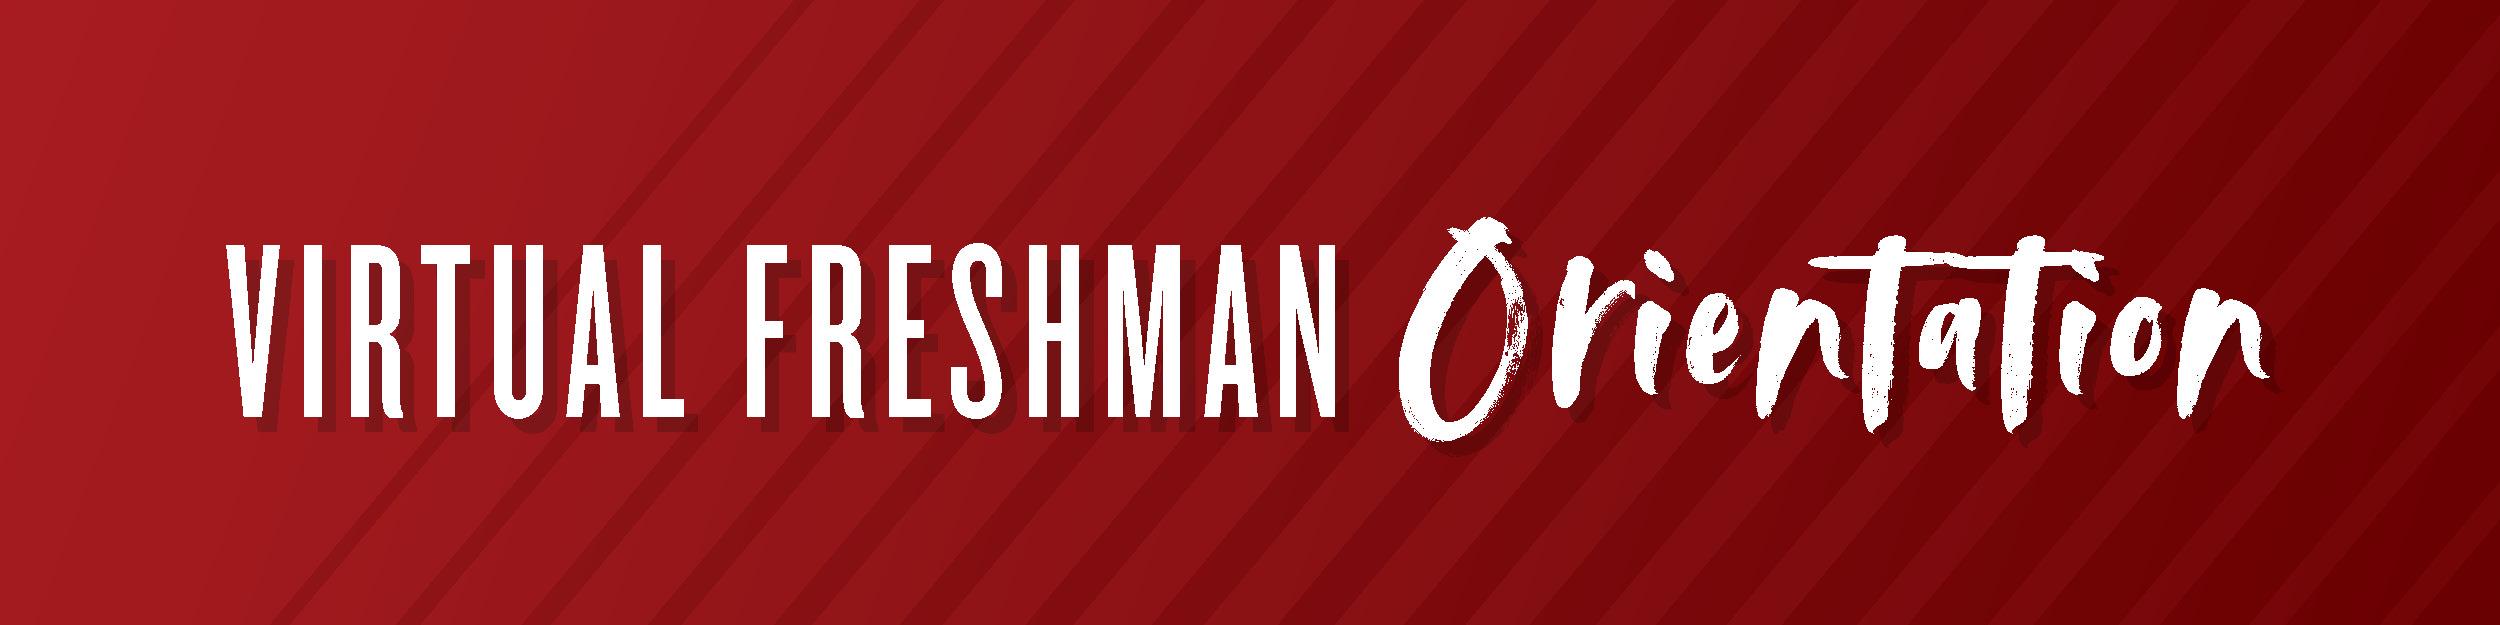 Virtual Freshman Orientation